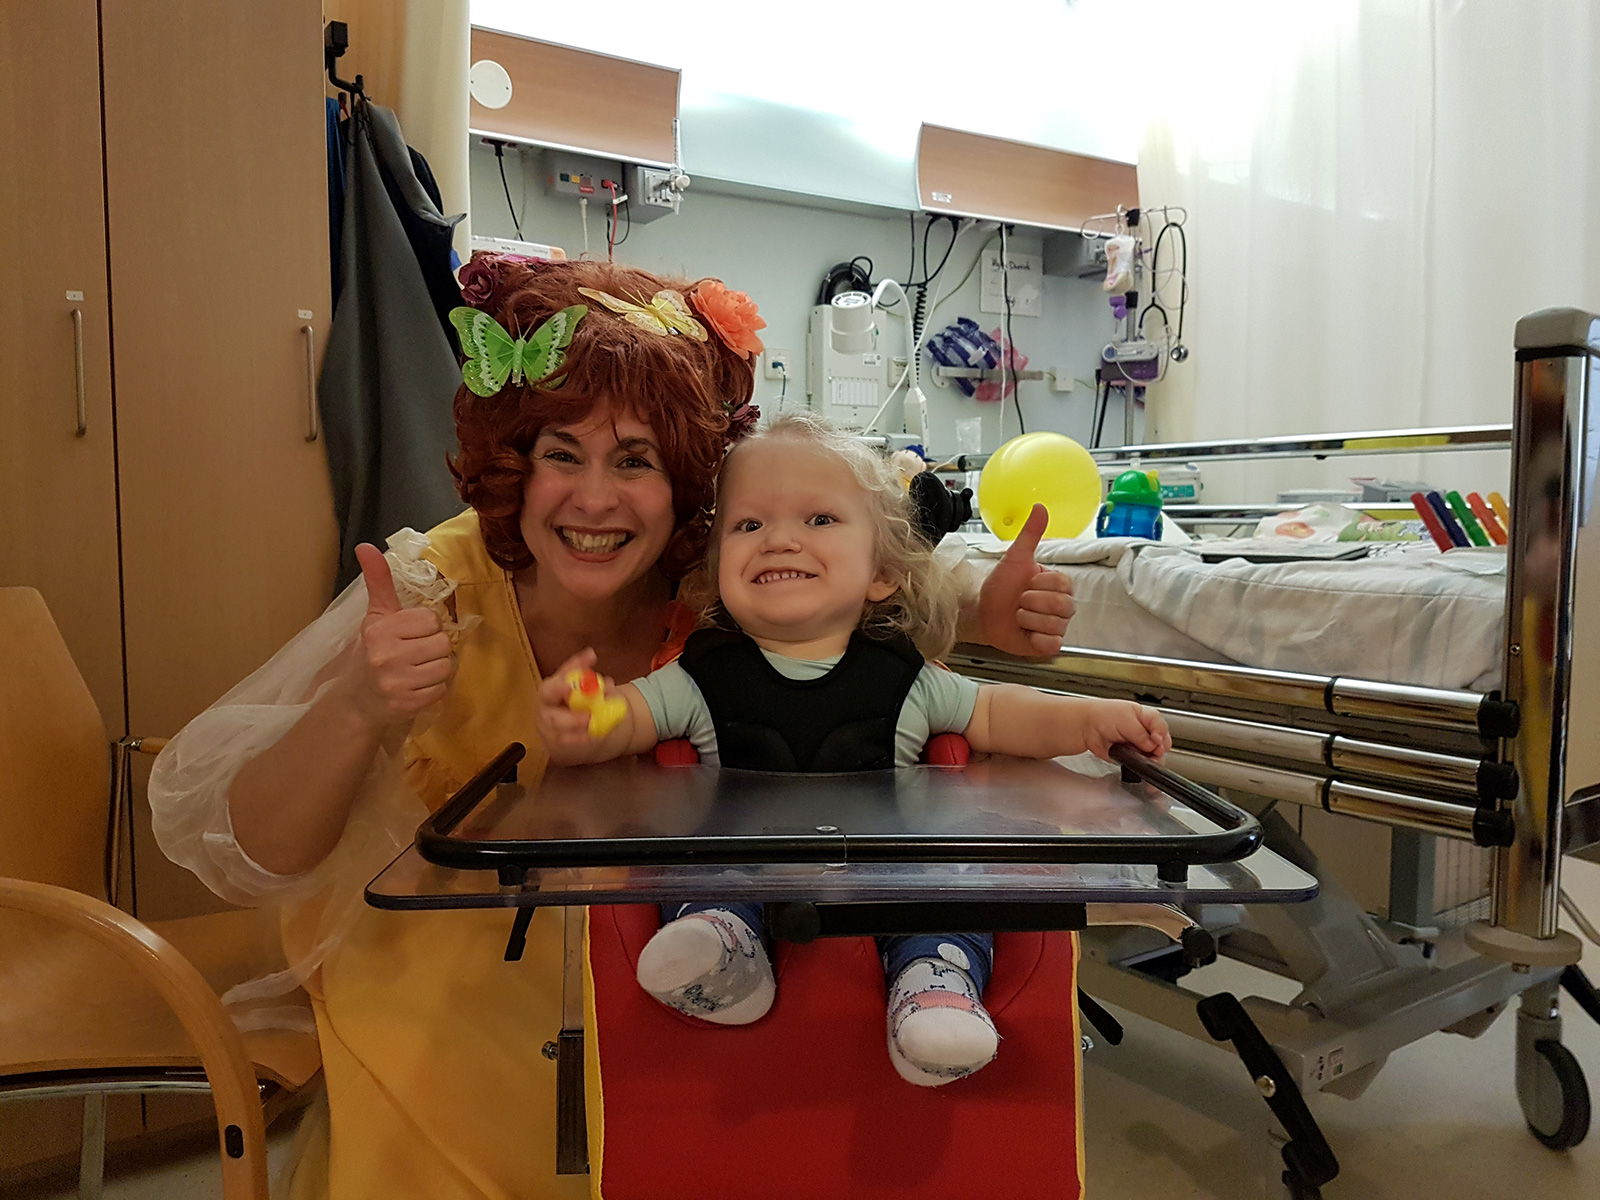 https://www.leukamusement.nl/wp-content/uploads/2019/06/kinderziekenhuis-meisje.jpg